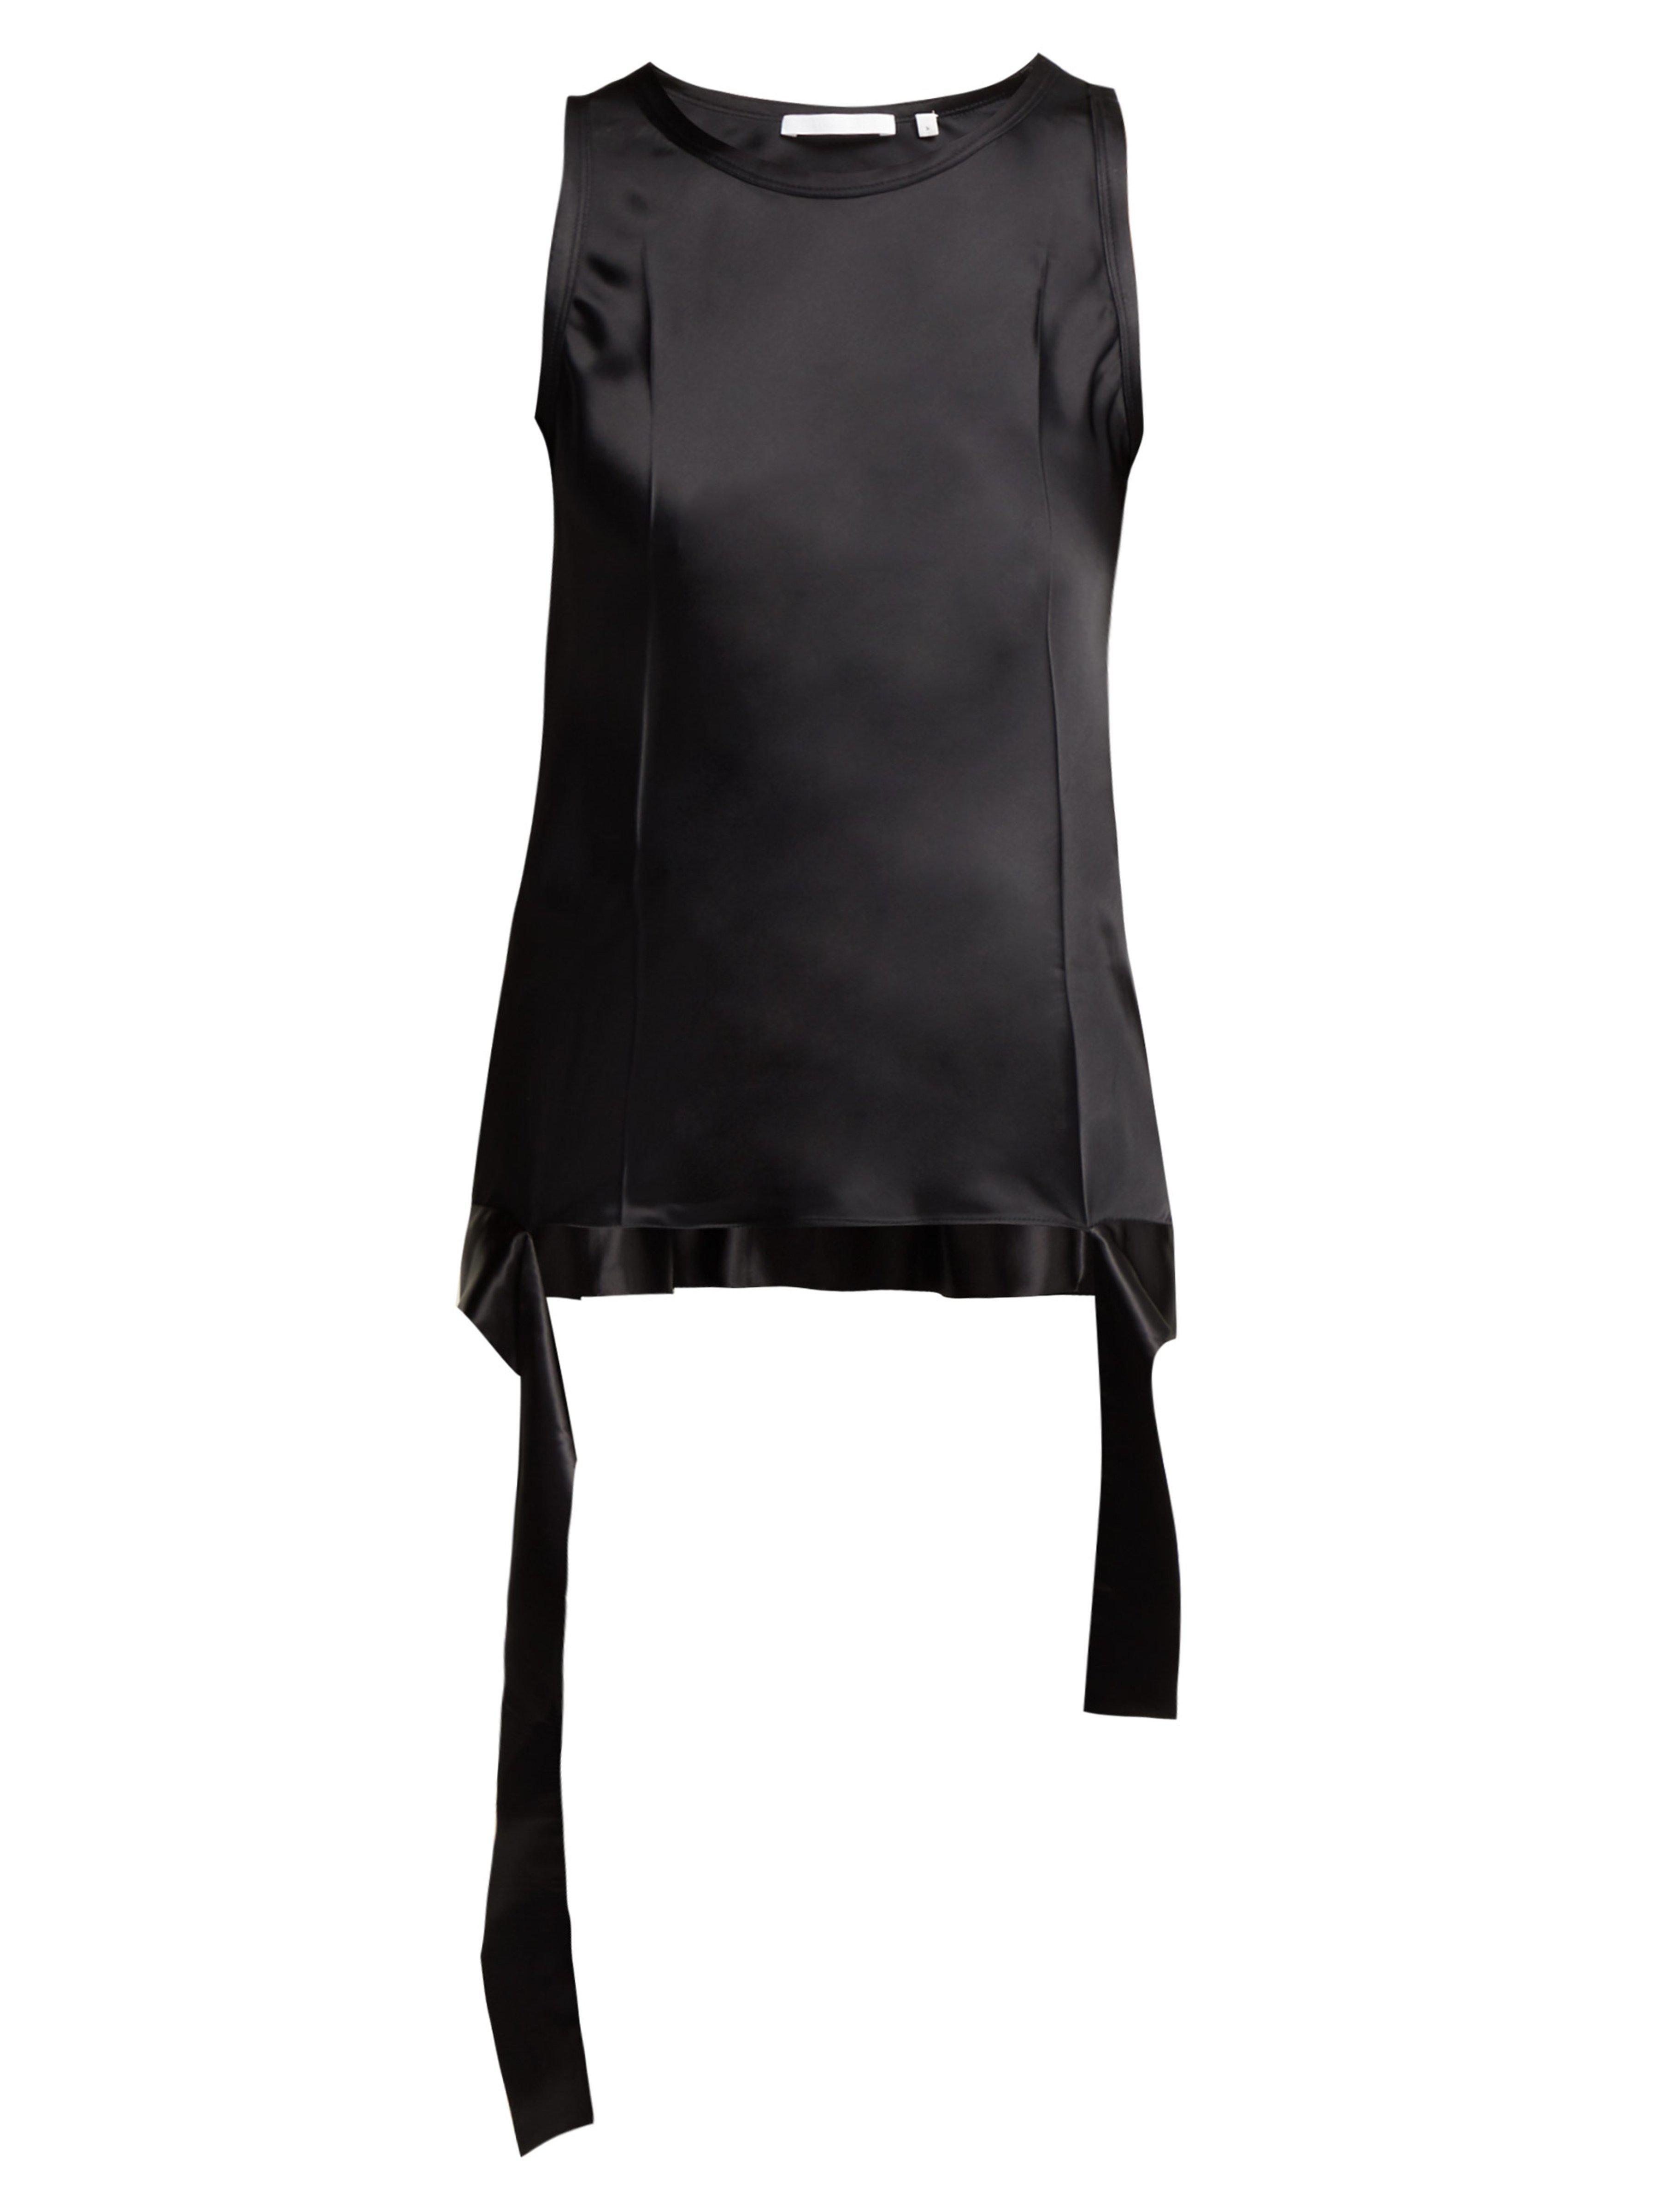 7ca90939a16 Helmut Lang Asymmetric Hem Sleeveless Satin Top in Black - Lyst